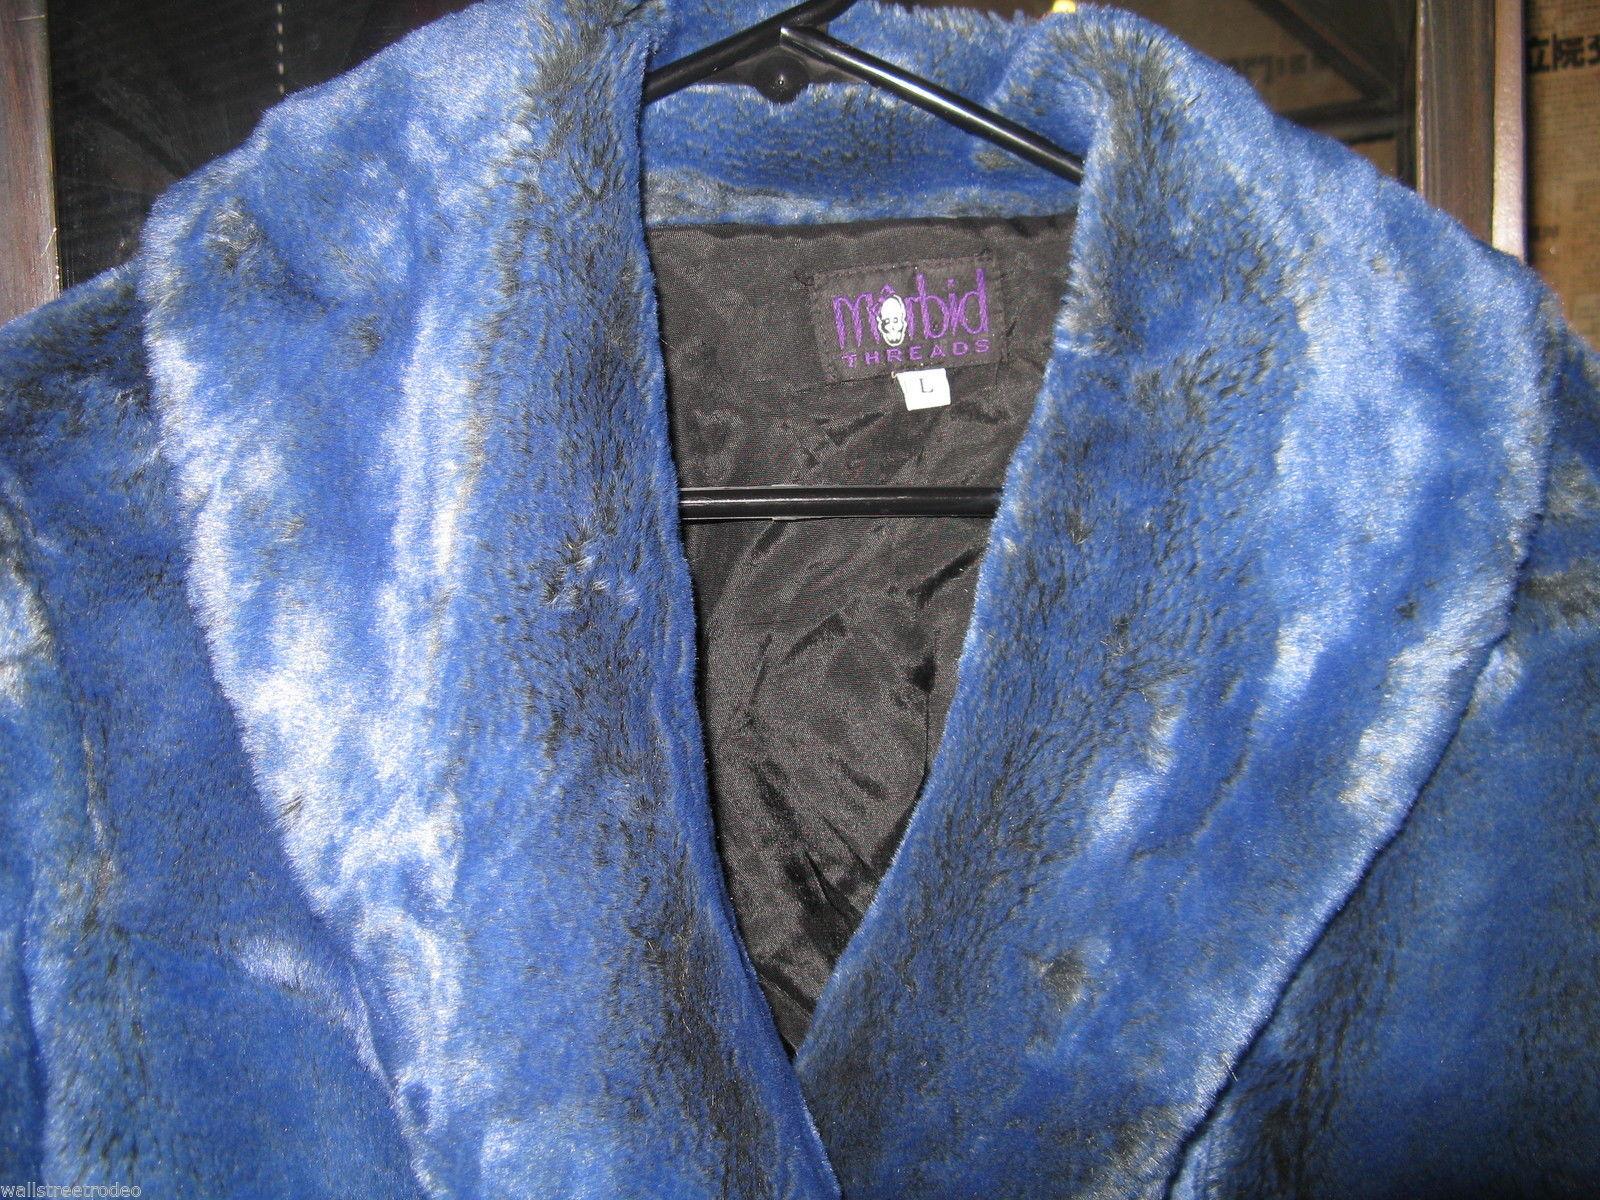 Rare Vintage 90s Morbid Threads monster fur raver glam pleather coat Rocker L image 3